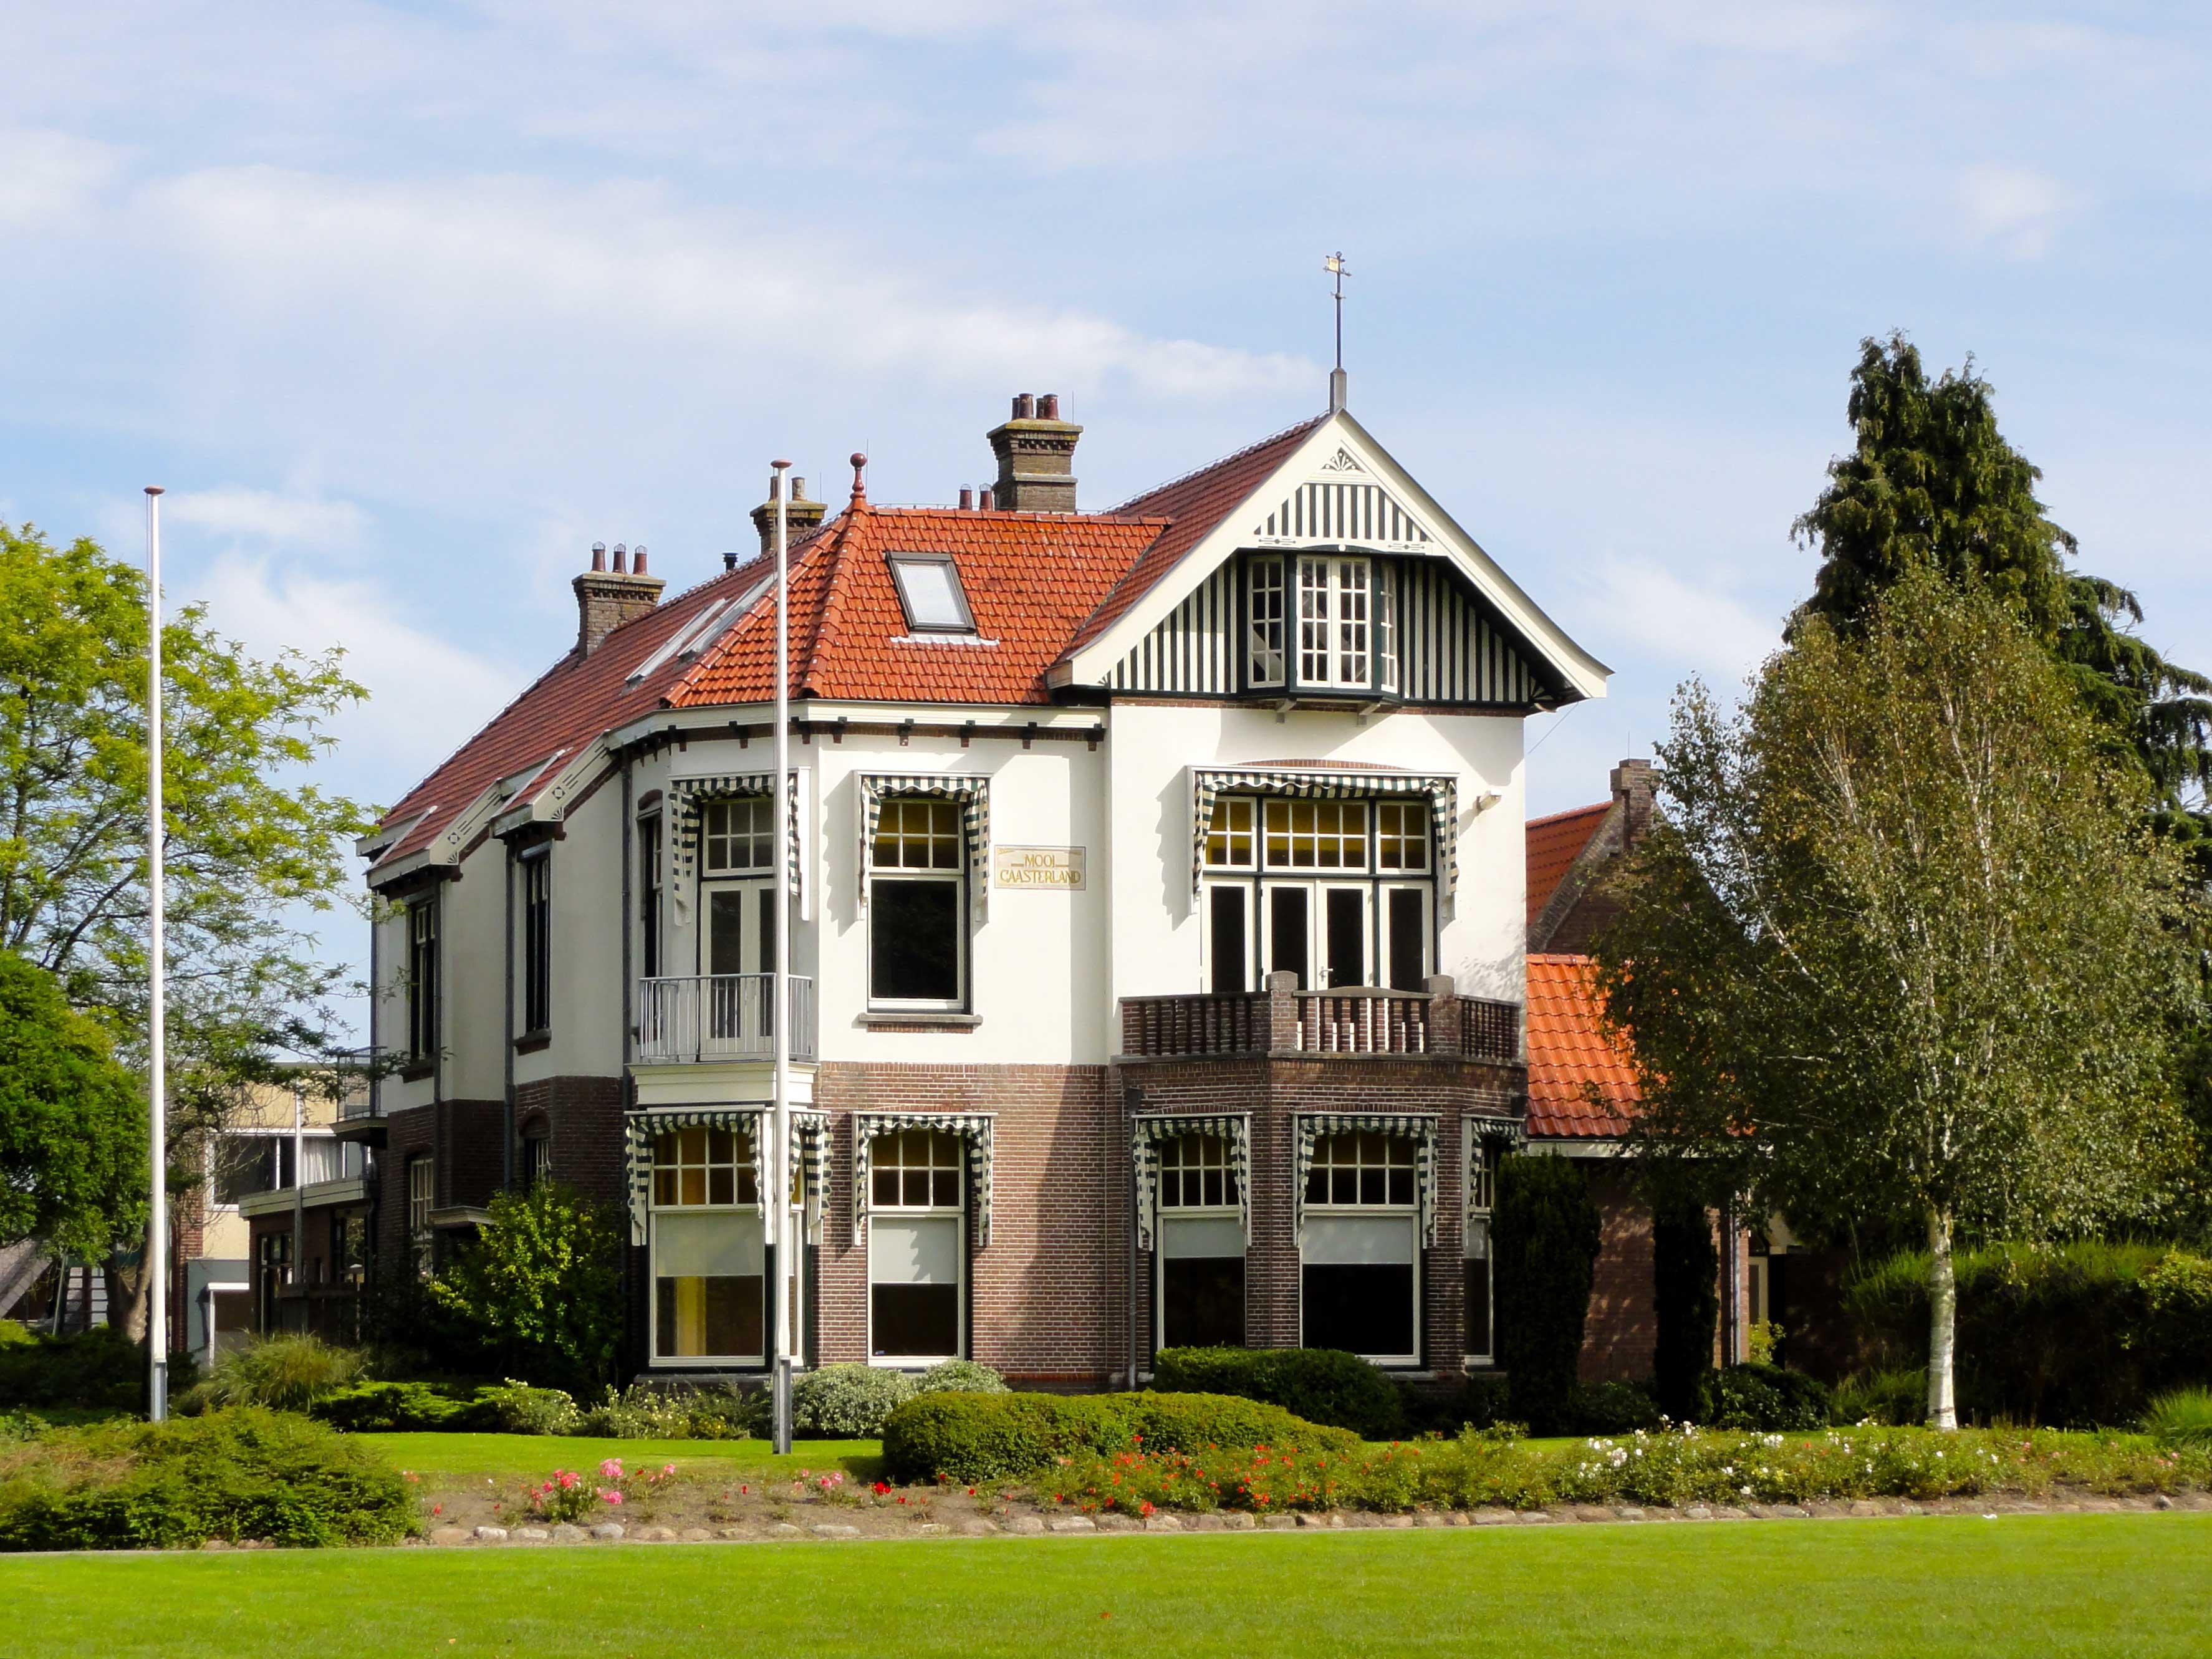 Mooi gaasterland for Huis laten stylen